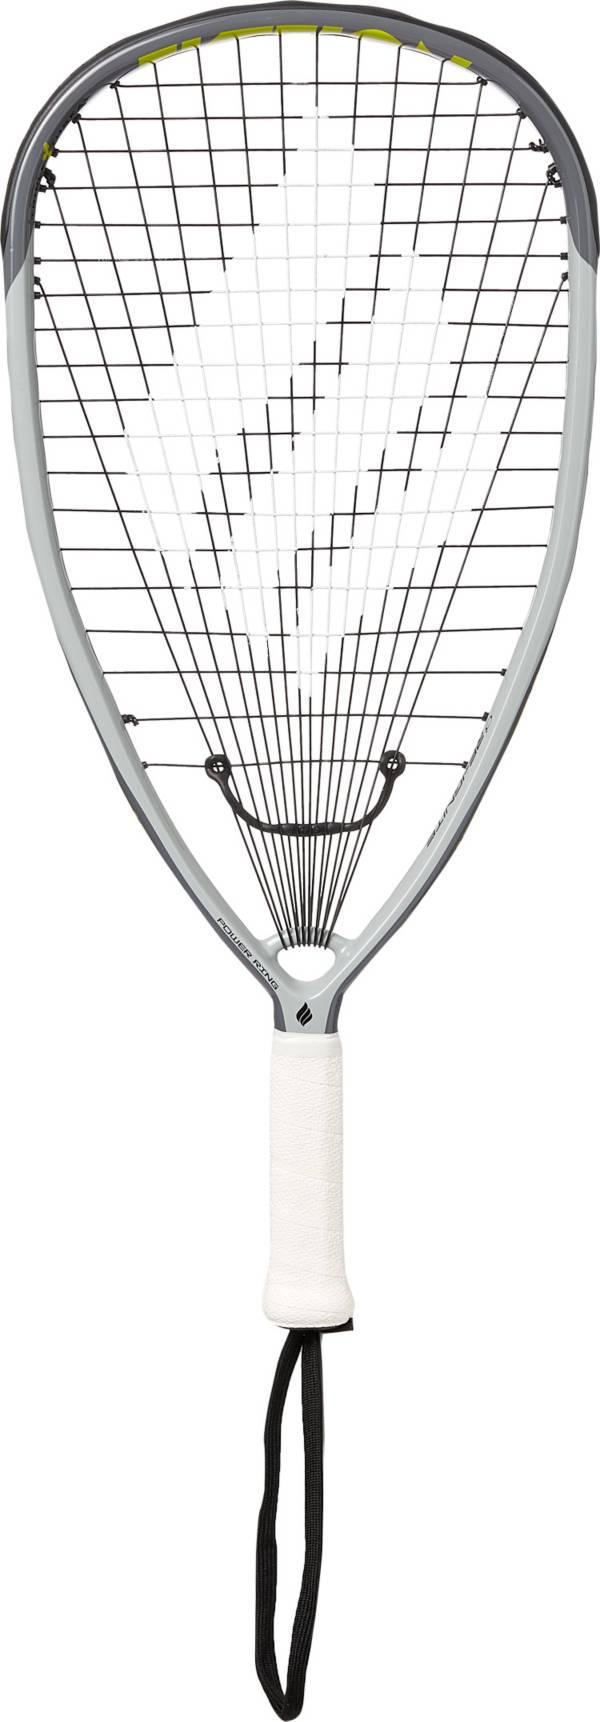 Ektelon Re-Ignite Racquetball Racquet product image